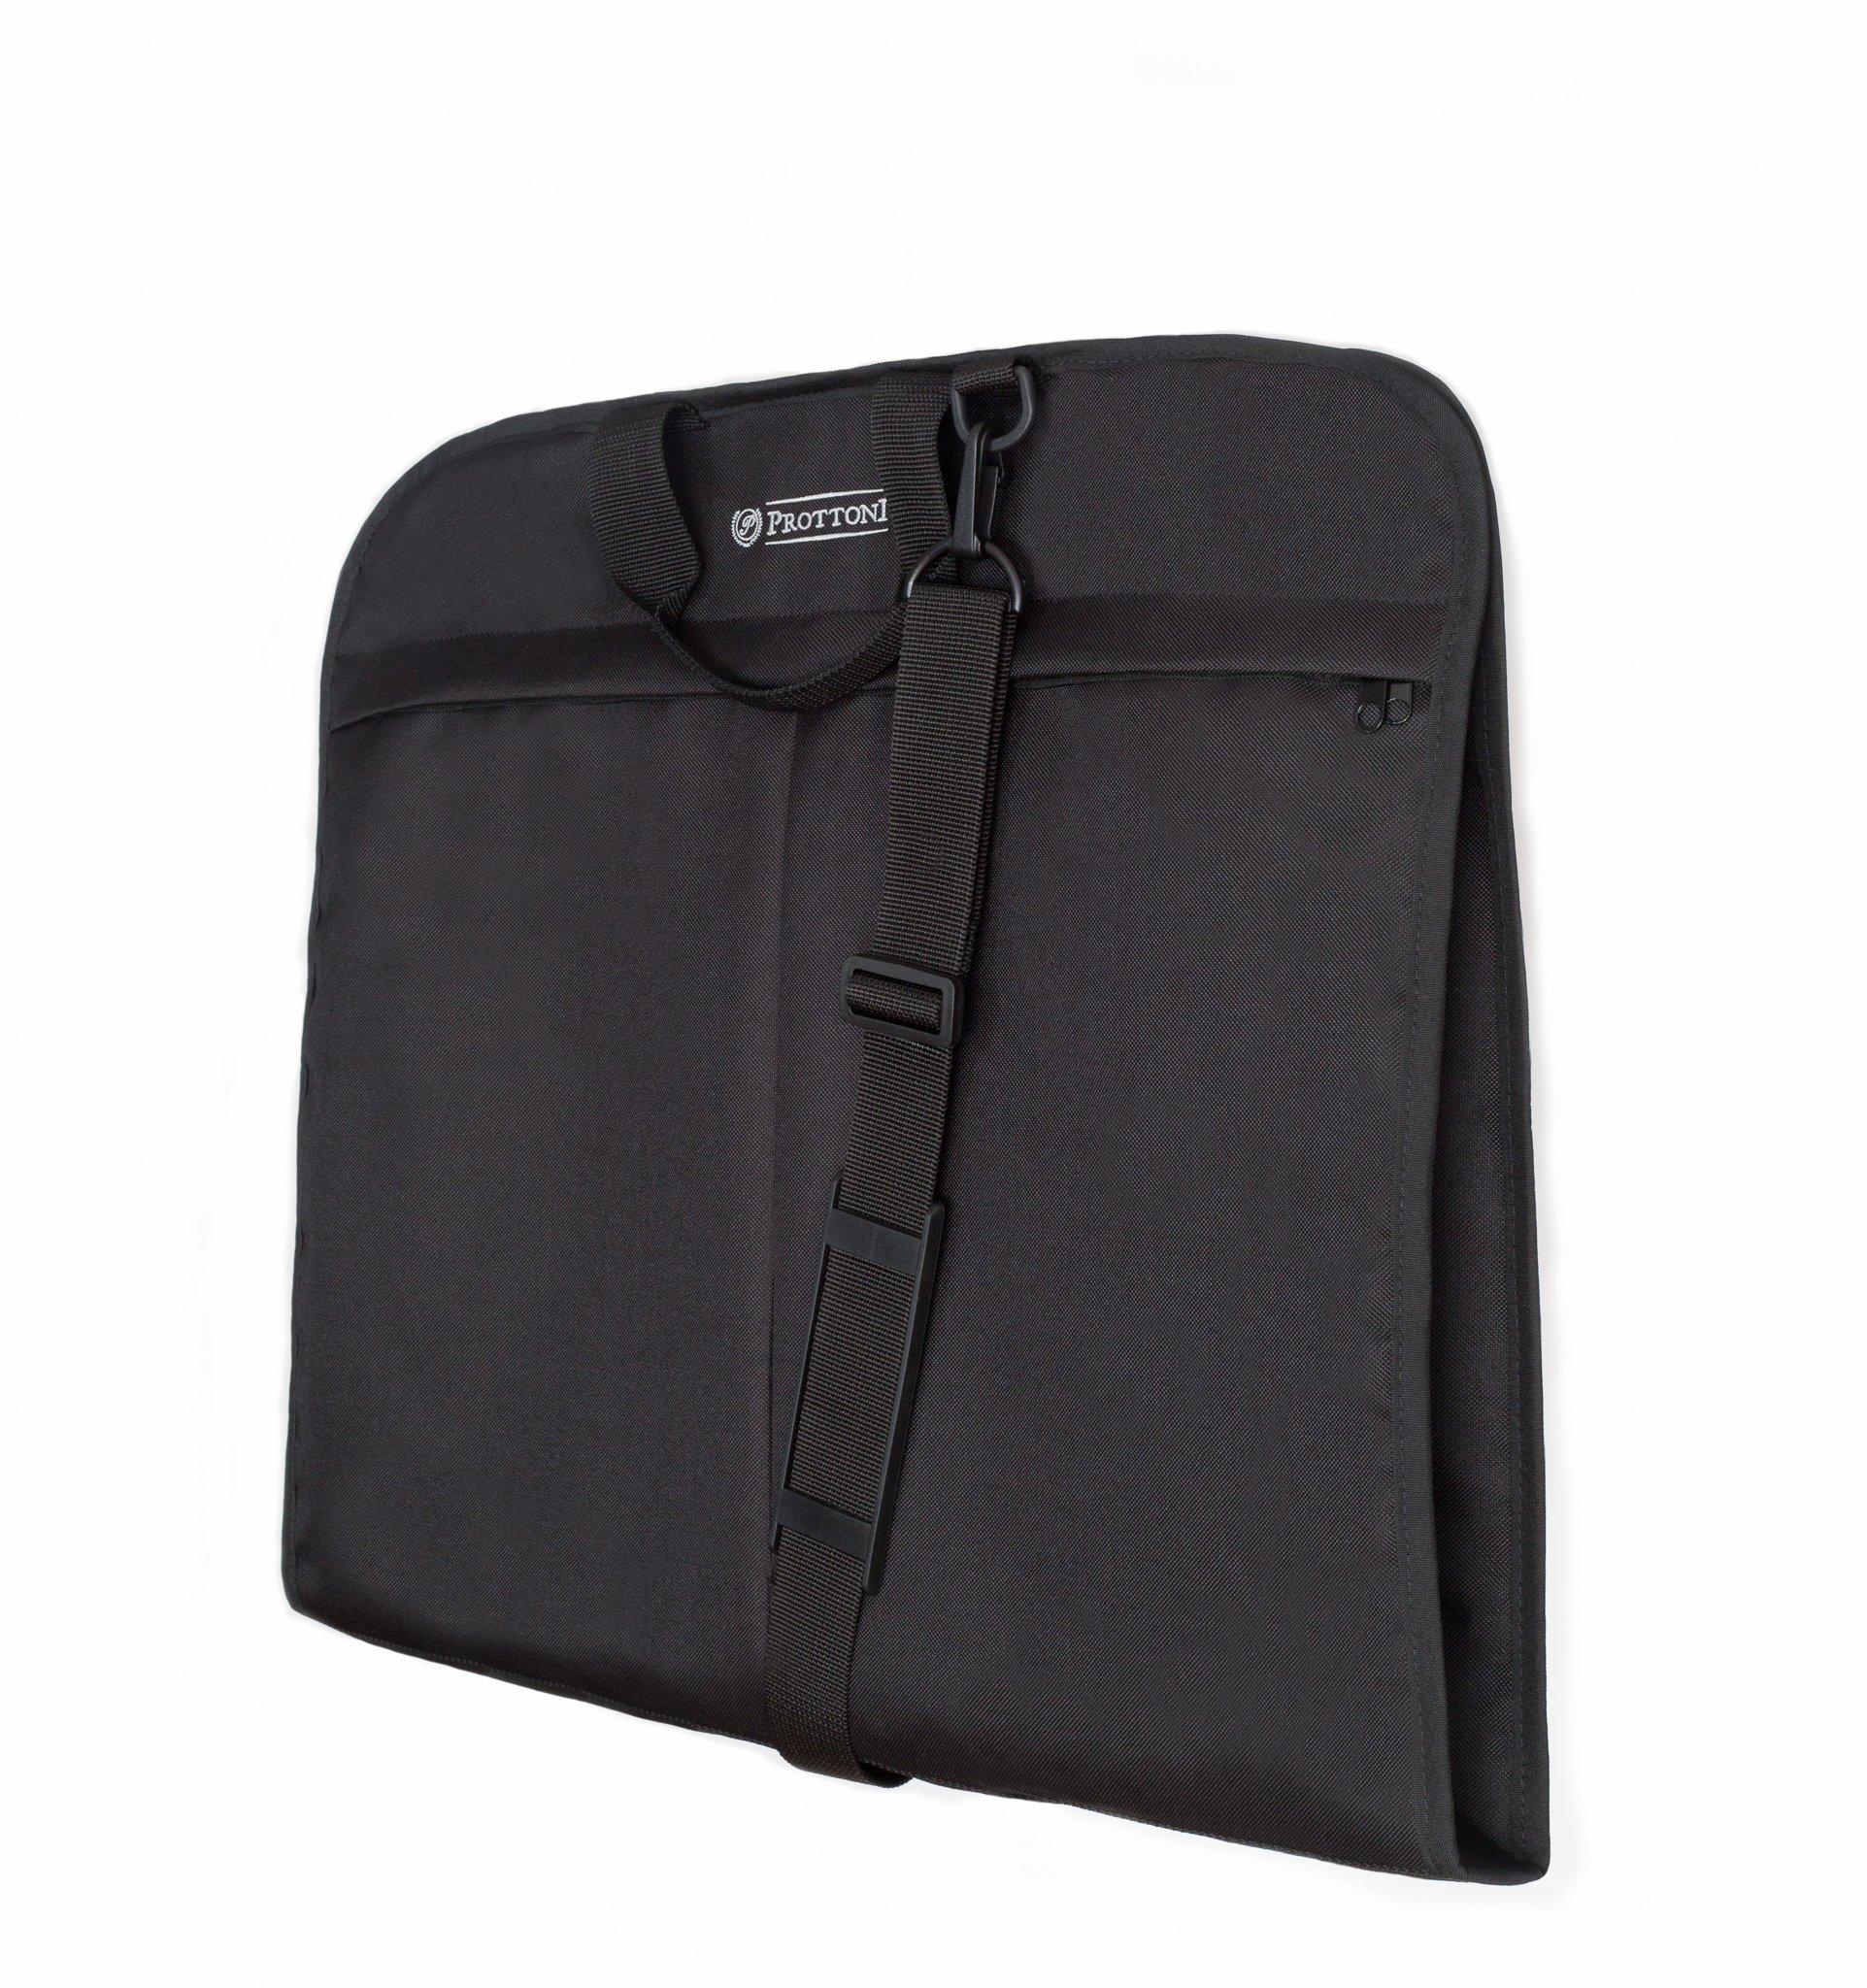 Prottoni 40'' Garment Bag - Carry on Suit Bag with Shoulder Strap - Water Resistant